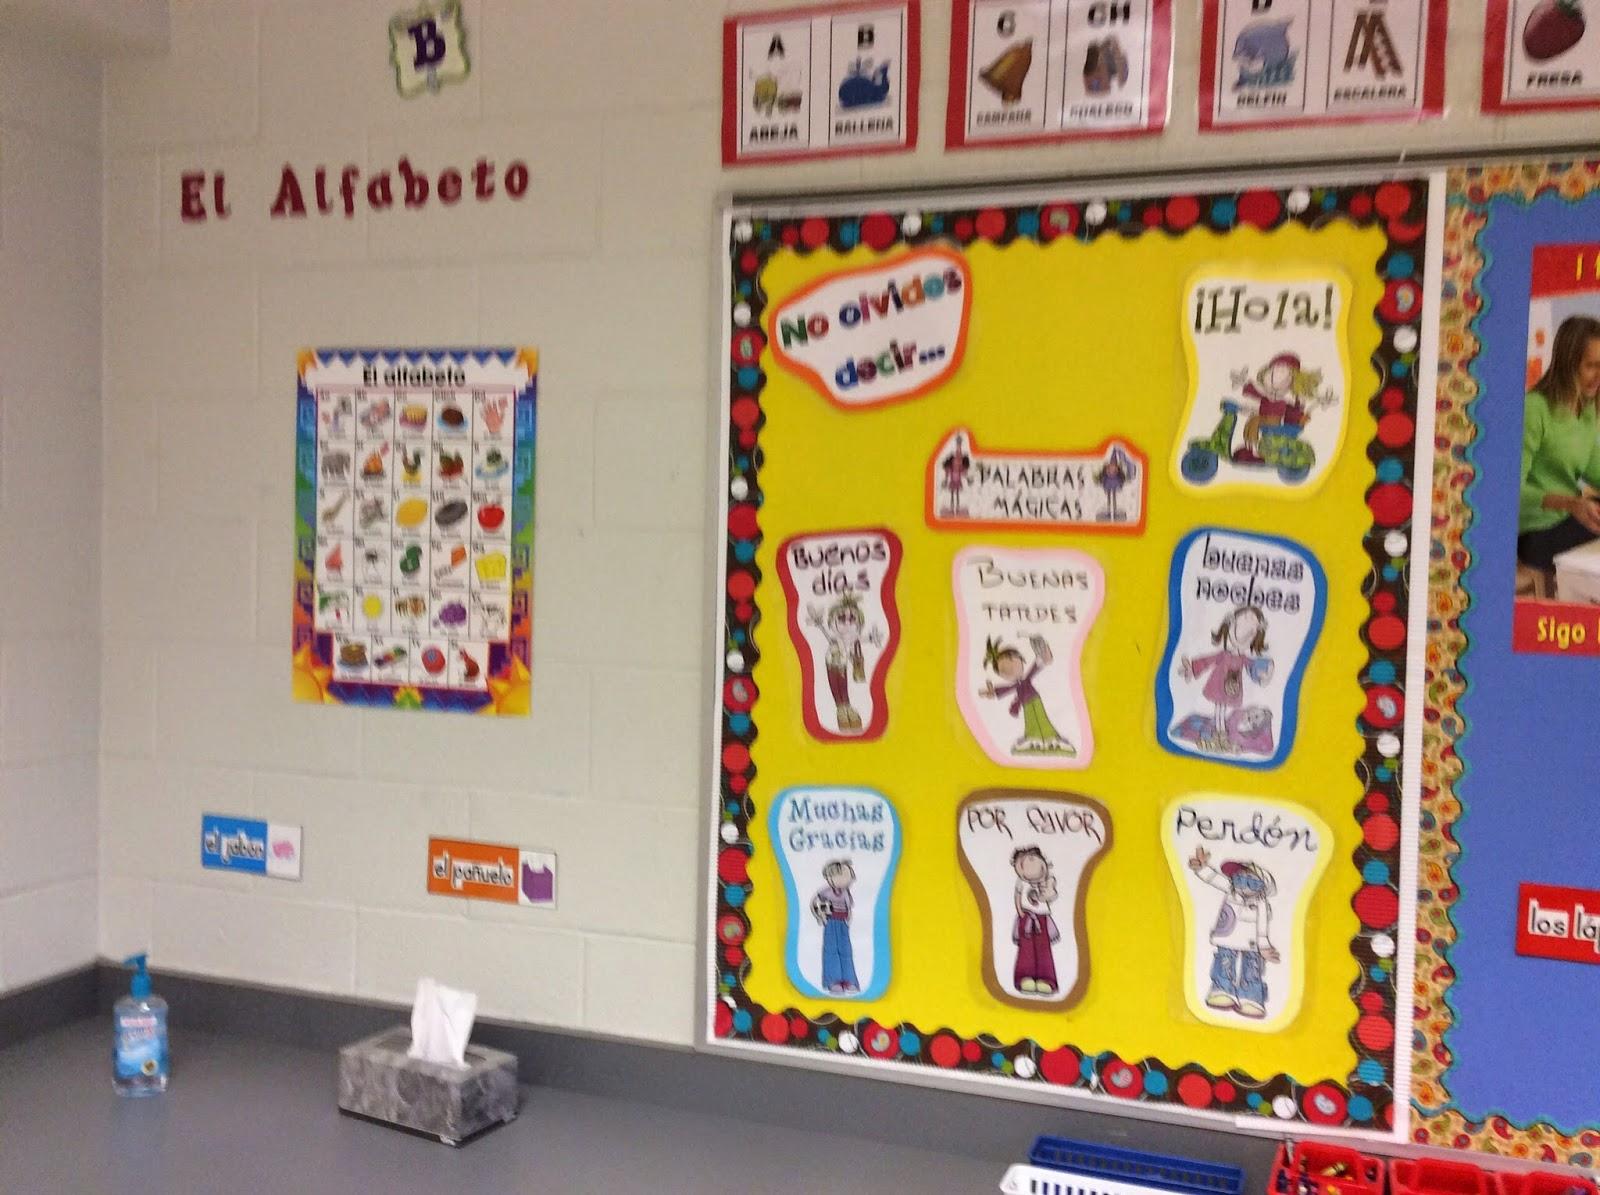 Aprendemos Espanol Rincones De Aprendizaje